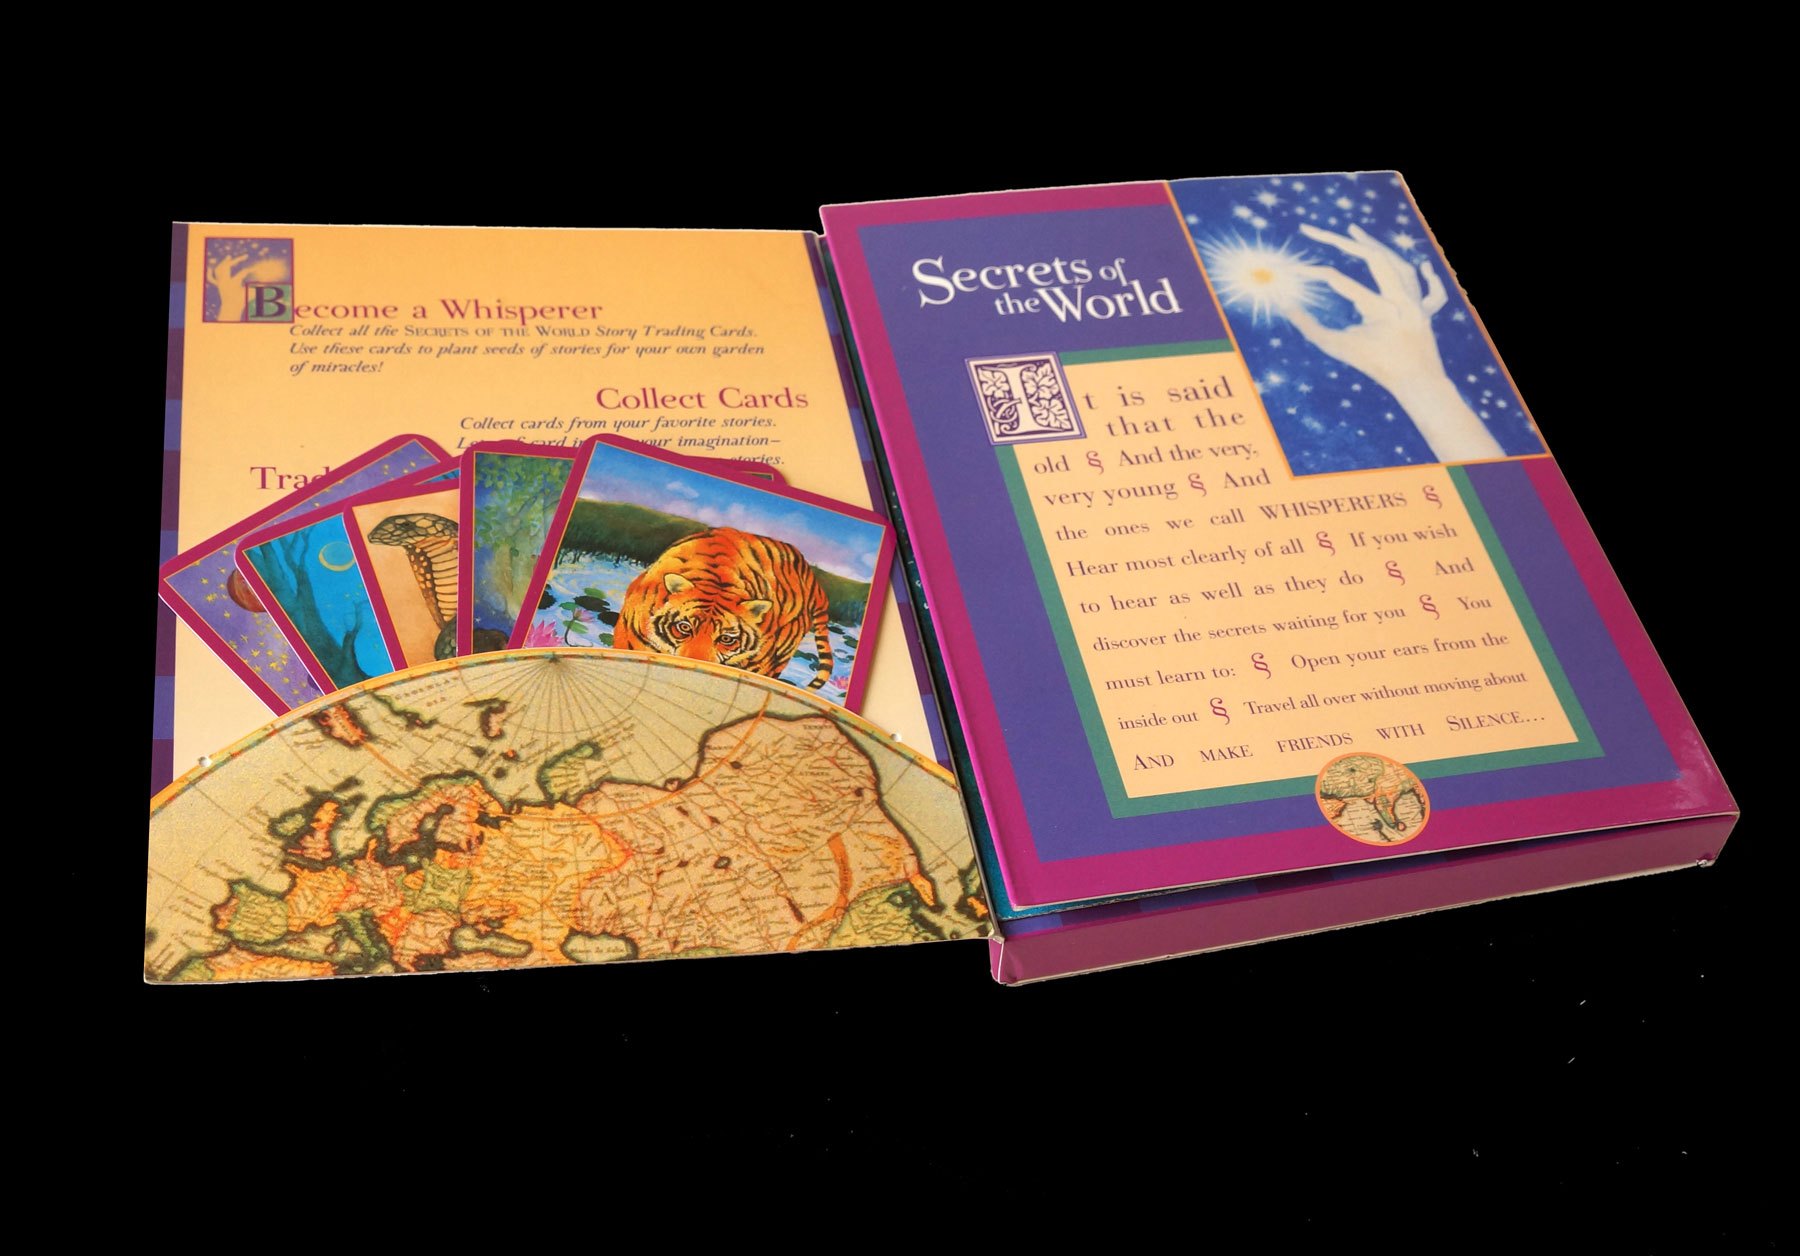 secrets-world-open-pack-1600-OP.jpg